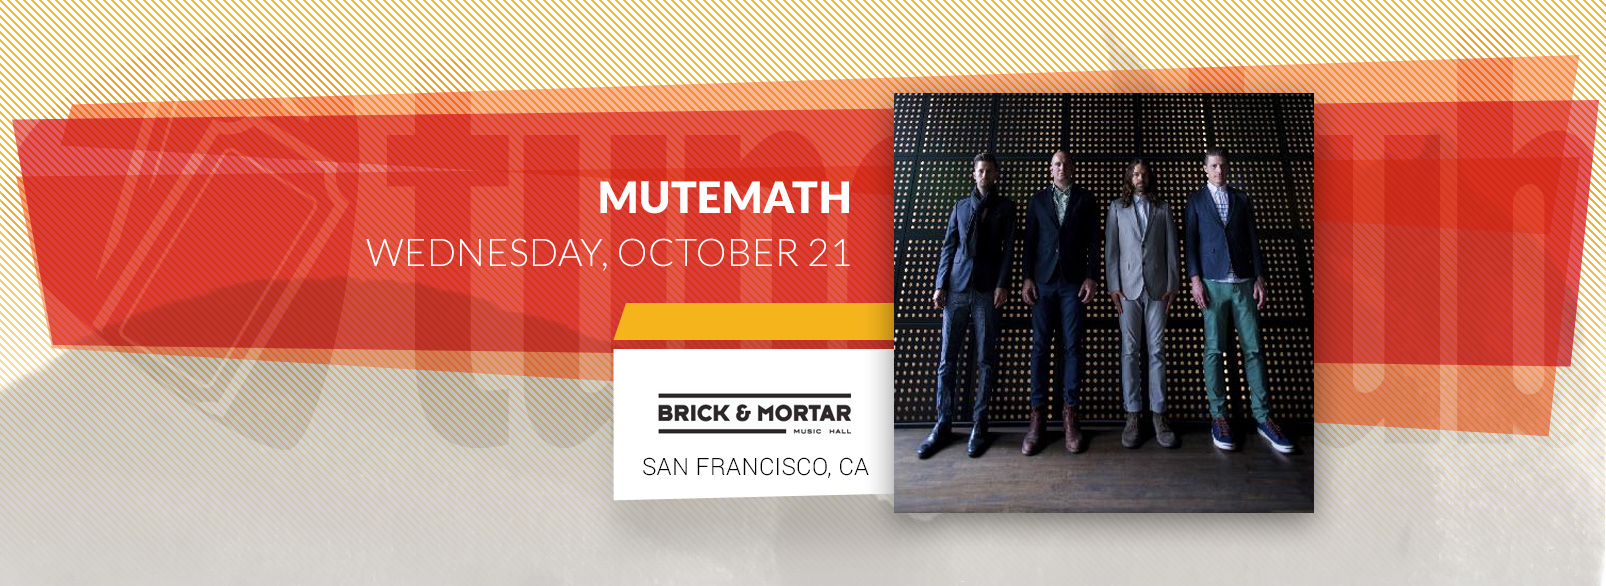 Mutemath @ Brick & Mortar